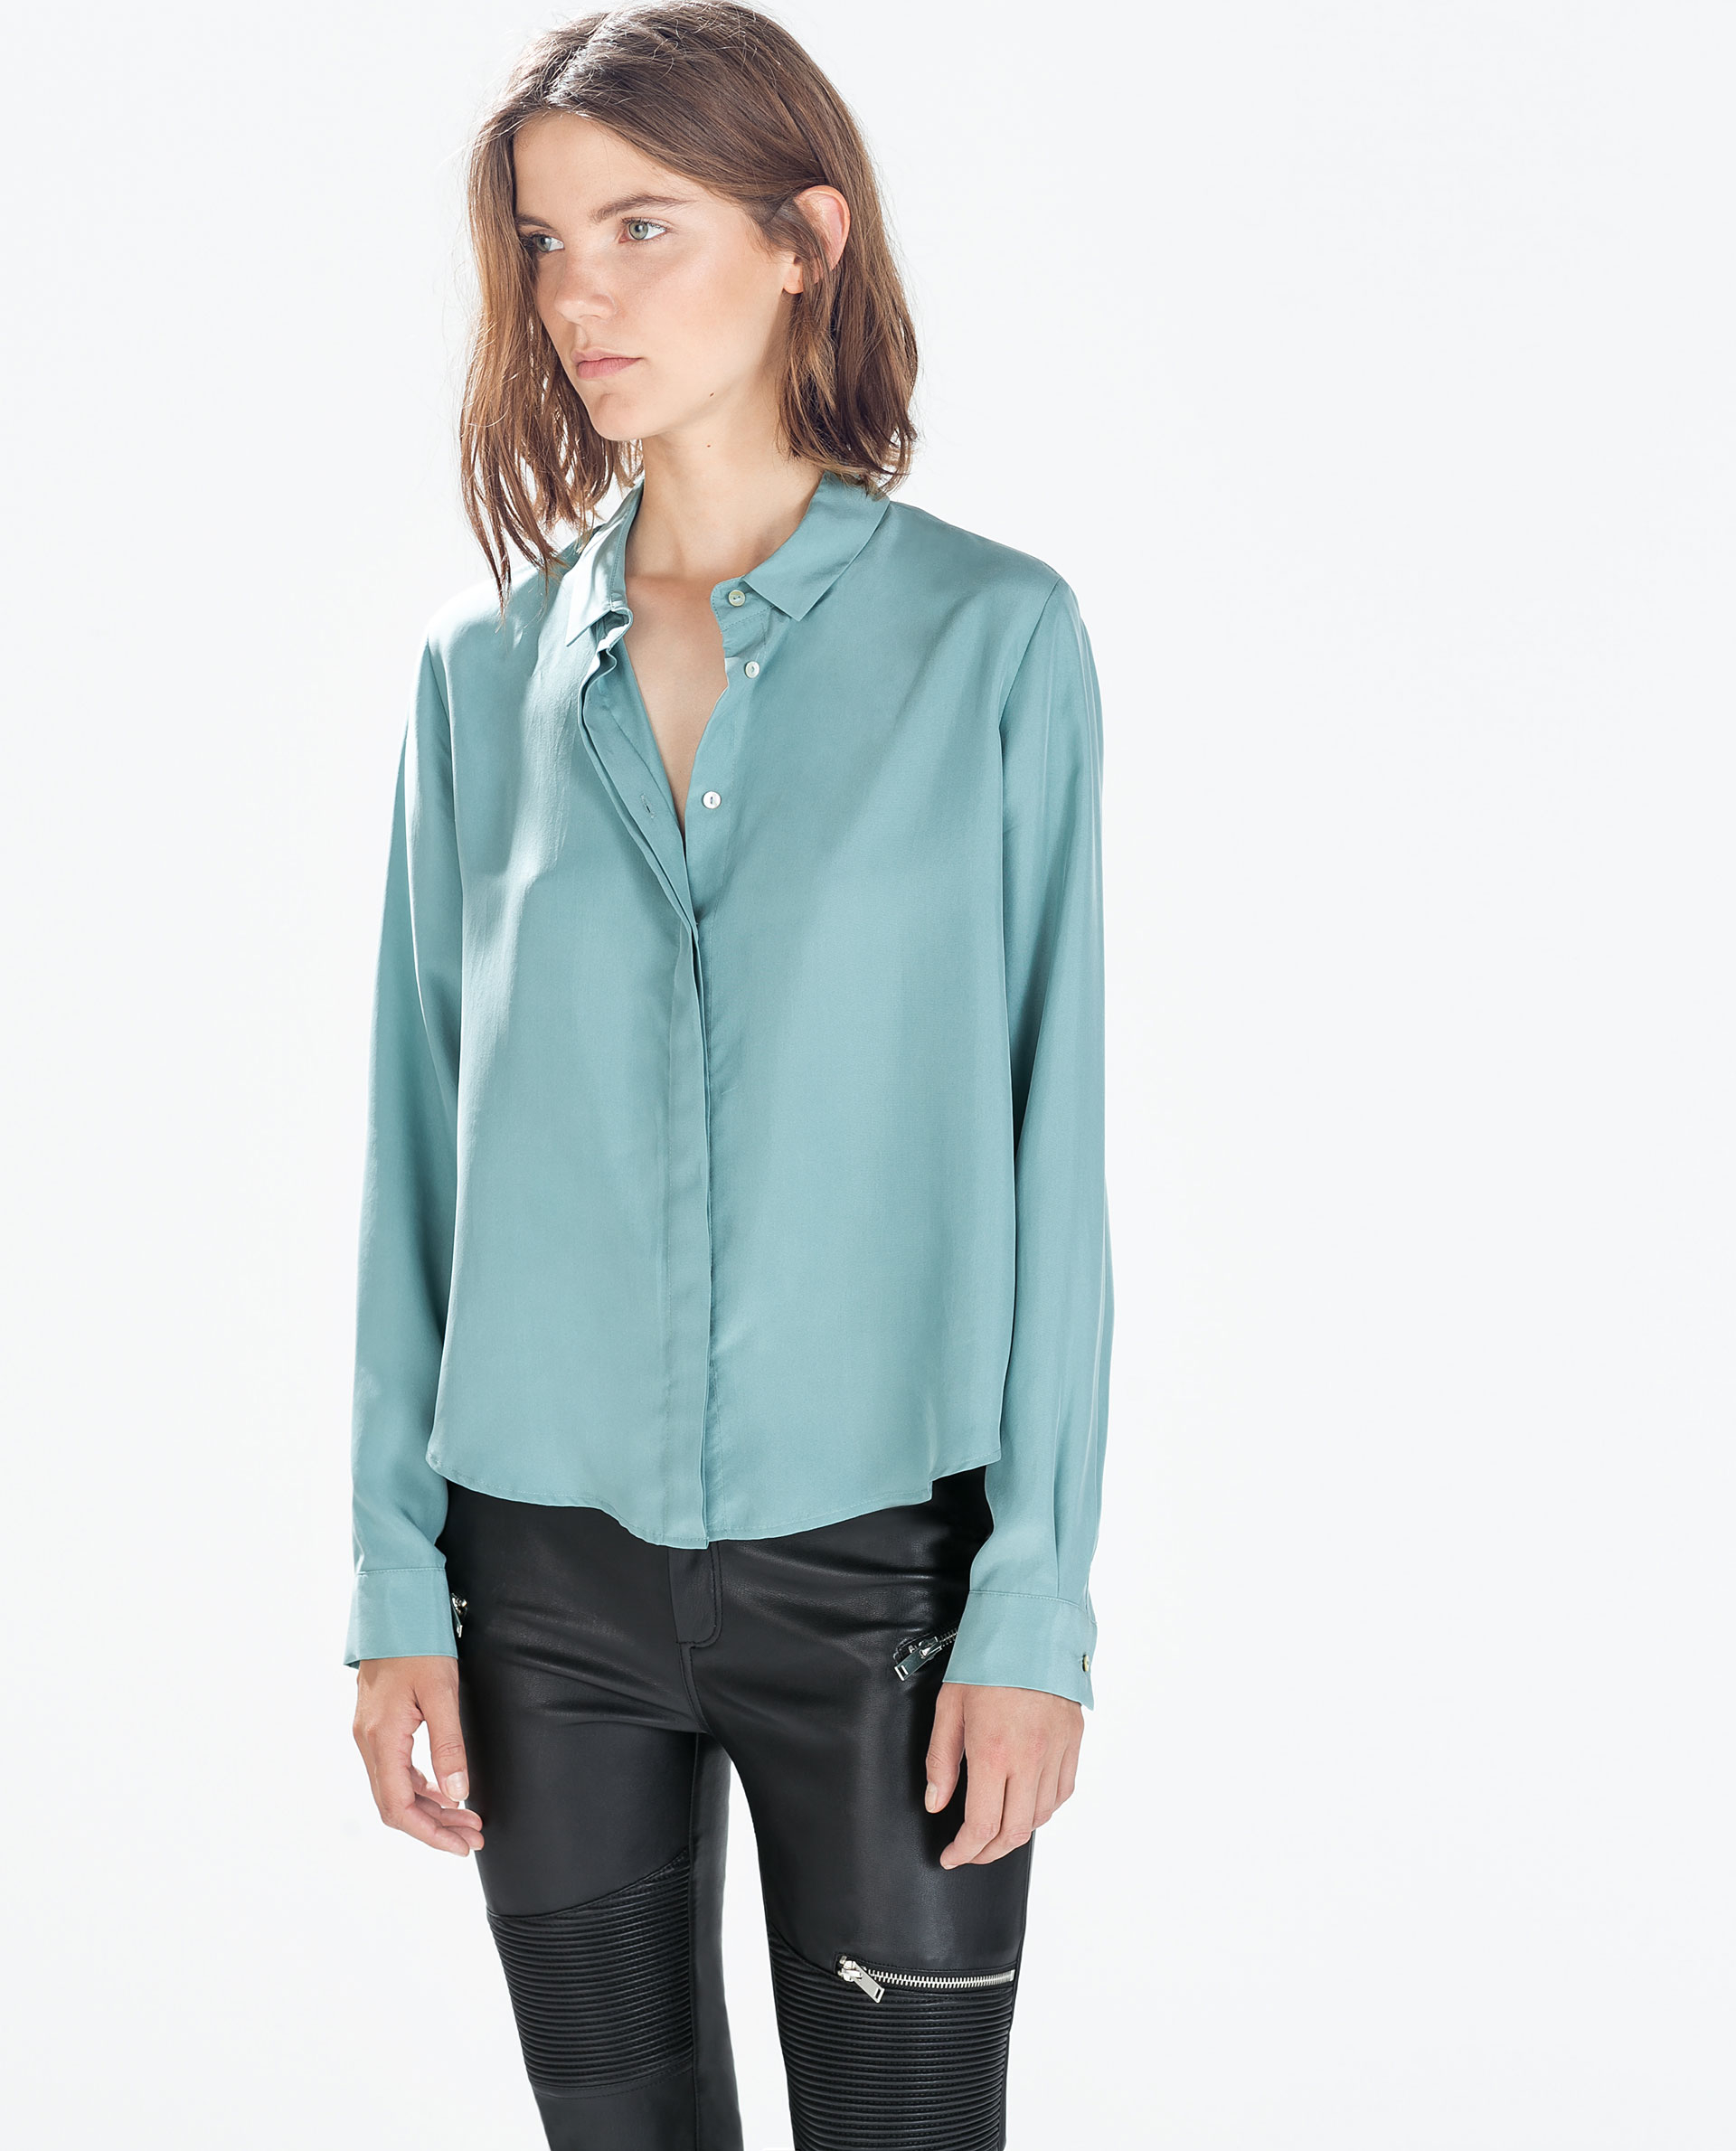 Zara Blue Silk Blouse 18